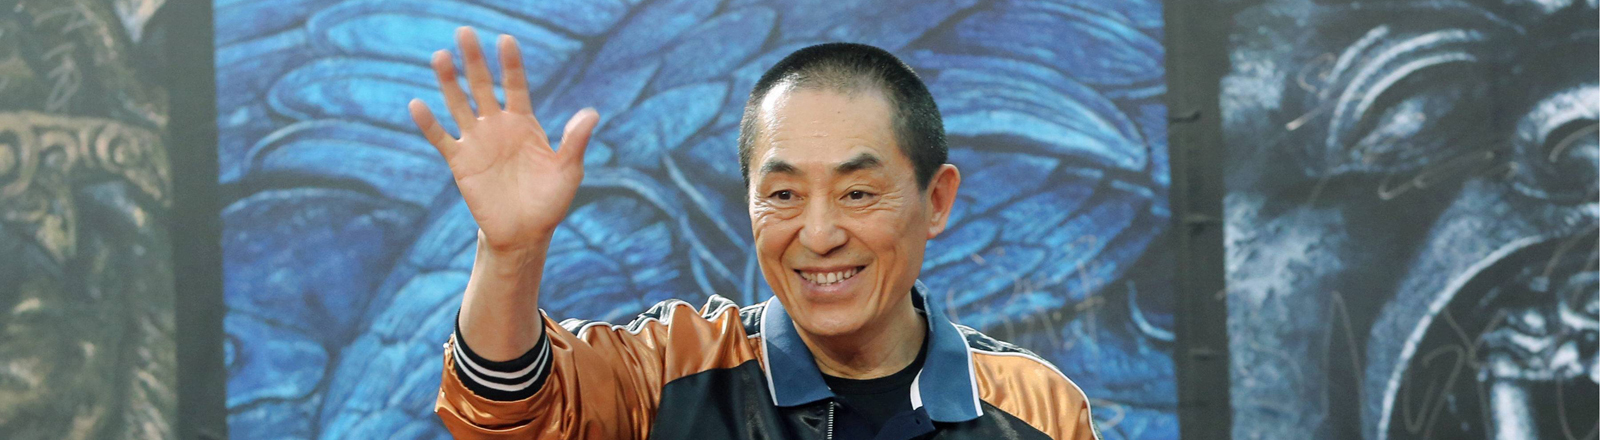 "Regisseur  Zhang Yimou bei einer Pressekonferenz zu ""The Great Wall"""